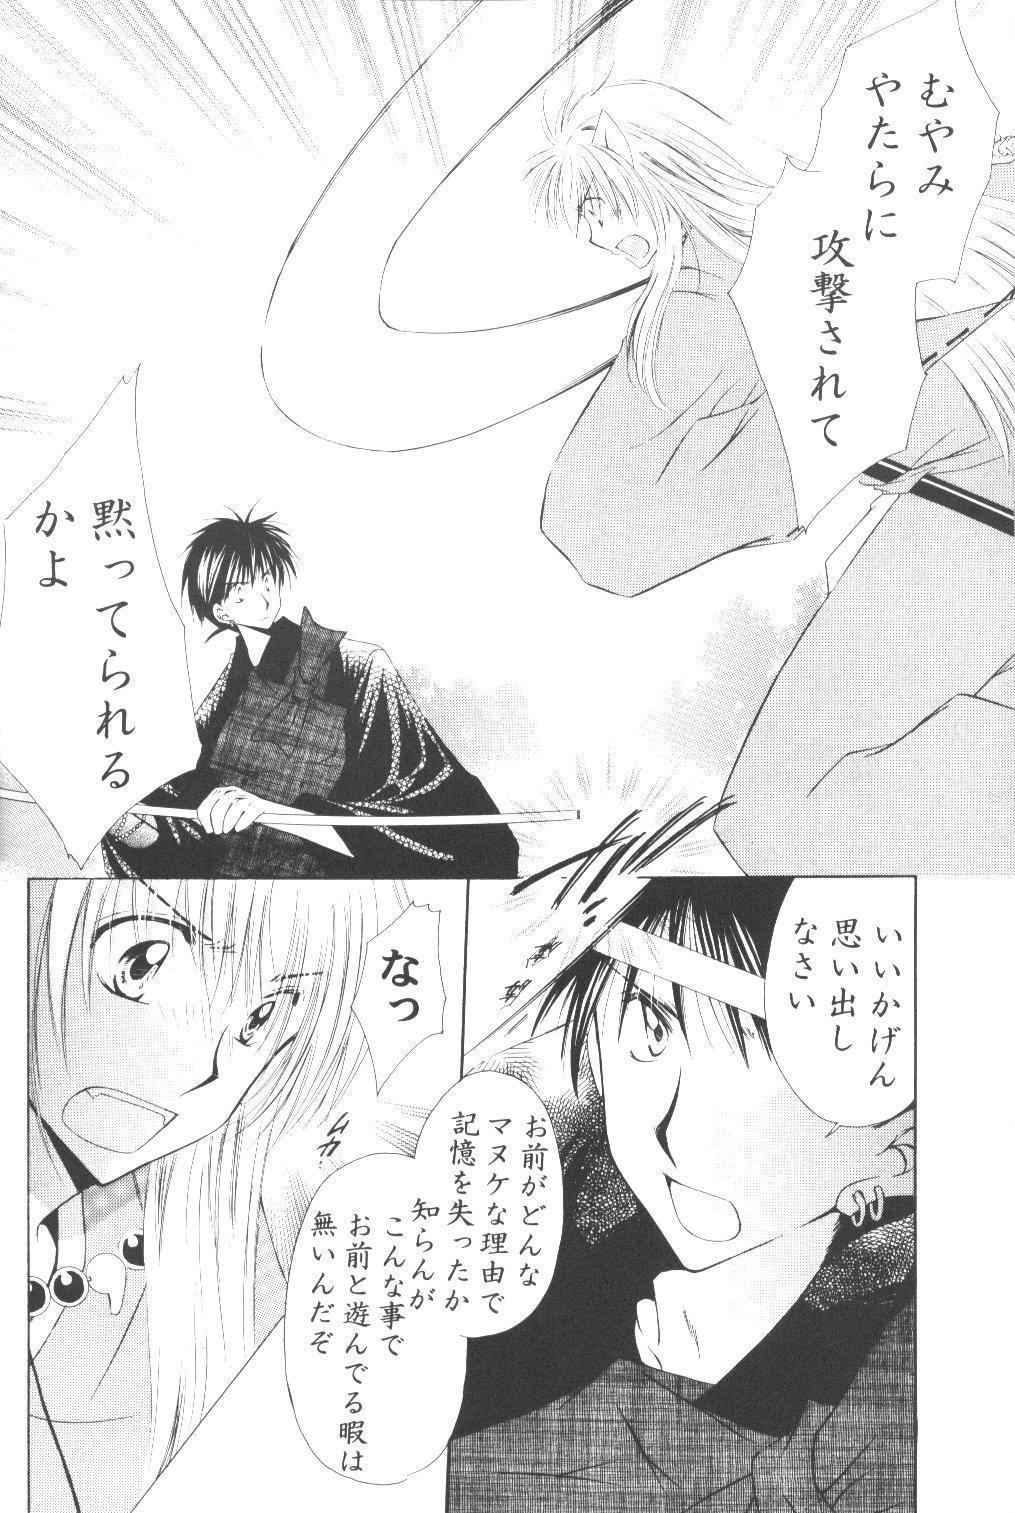 Ryuusei Ryodan 25